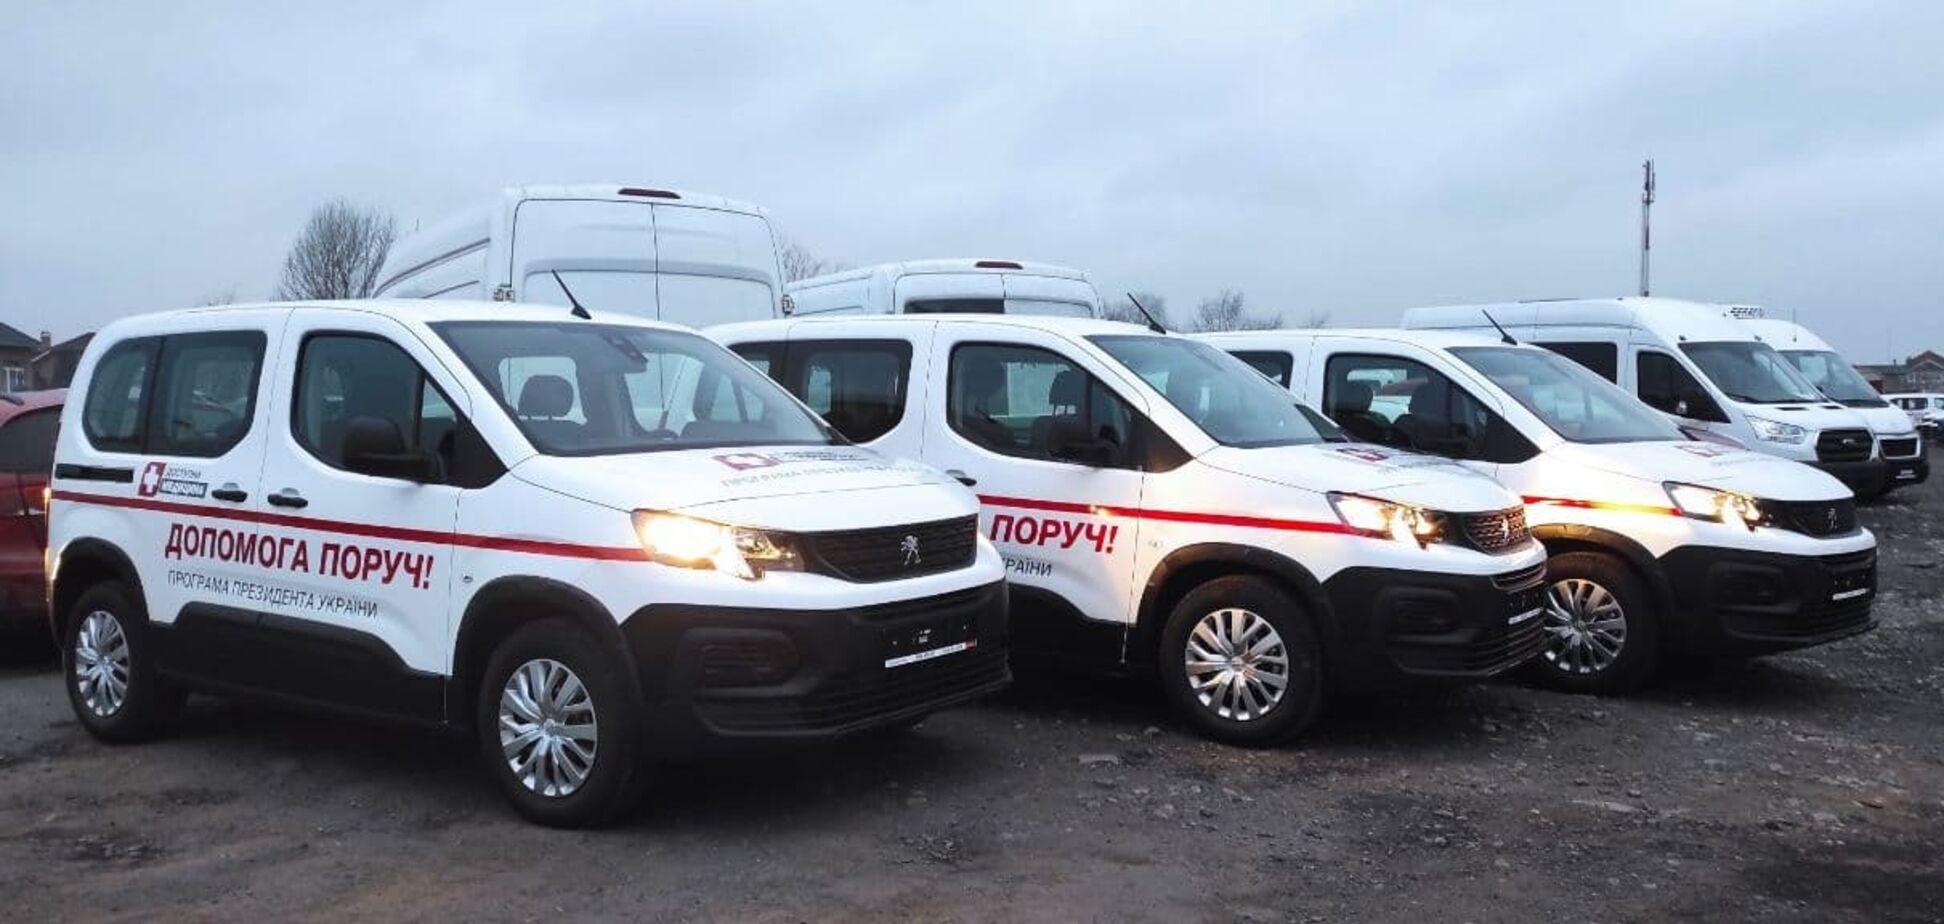 Українські медики їздитимуть на Peugeot